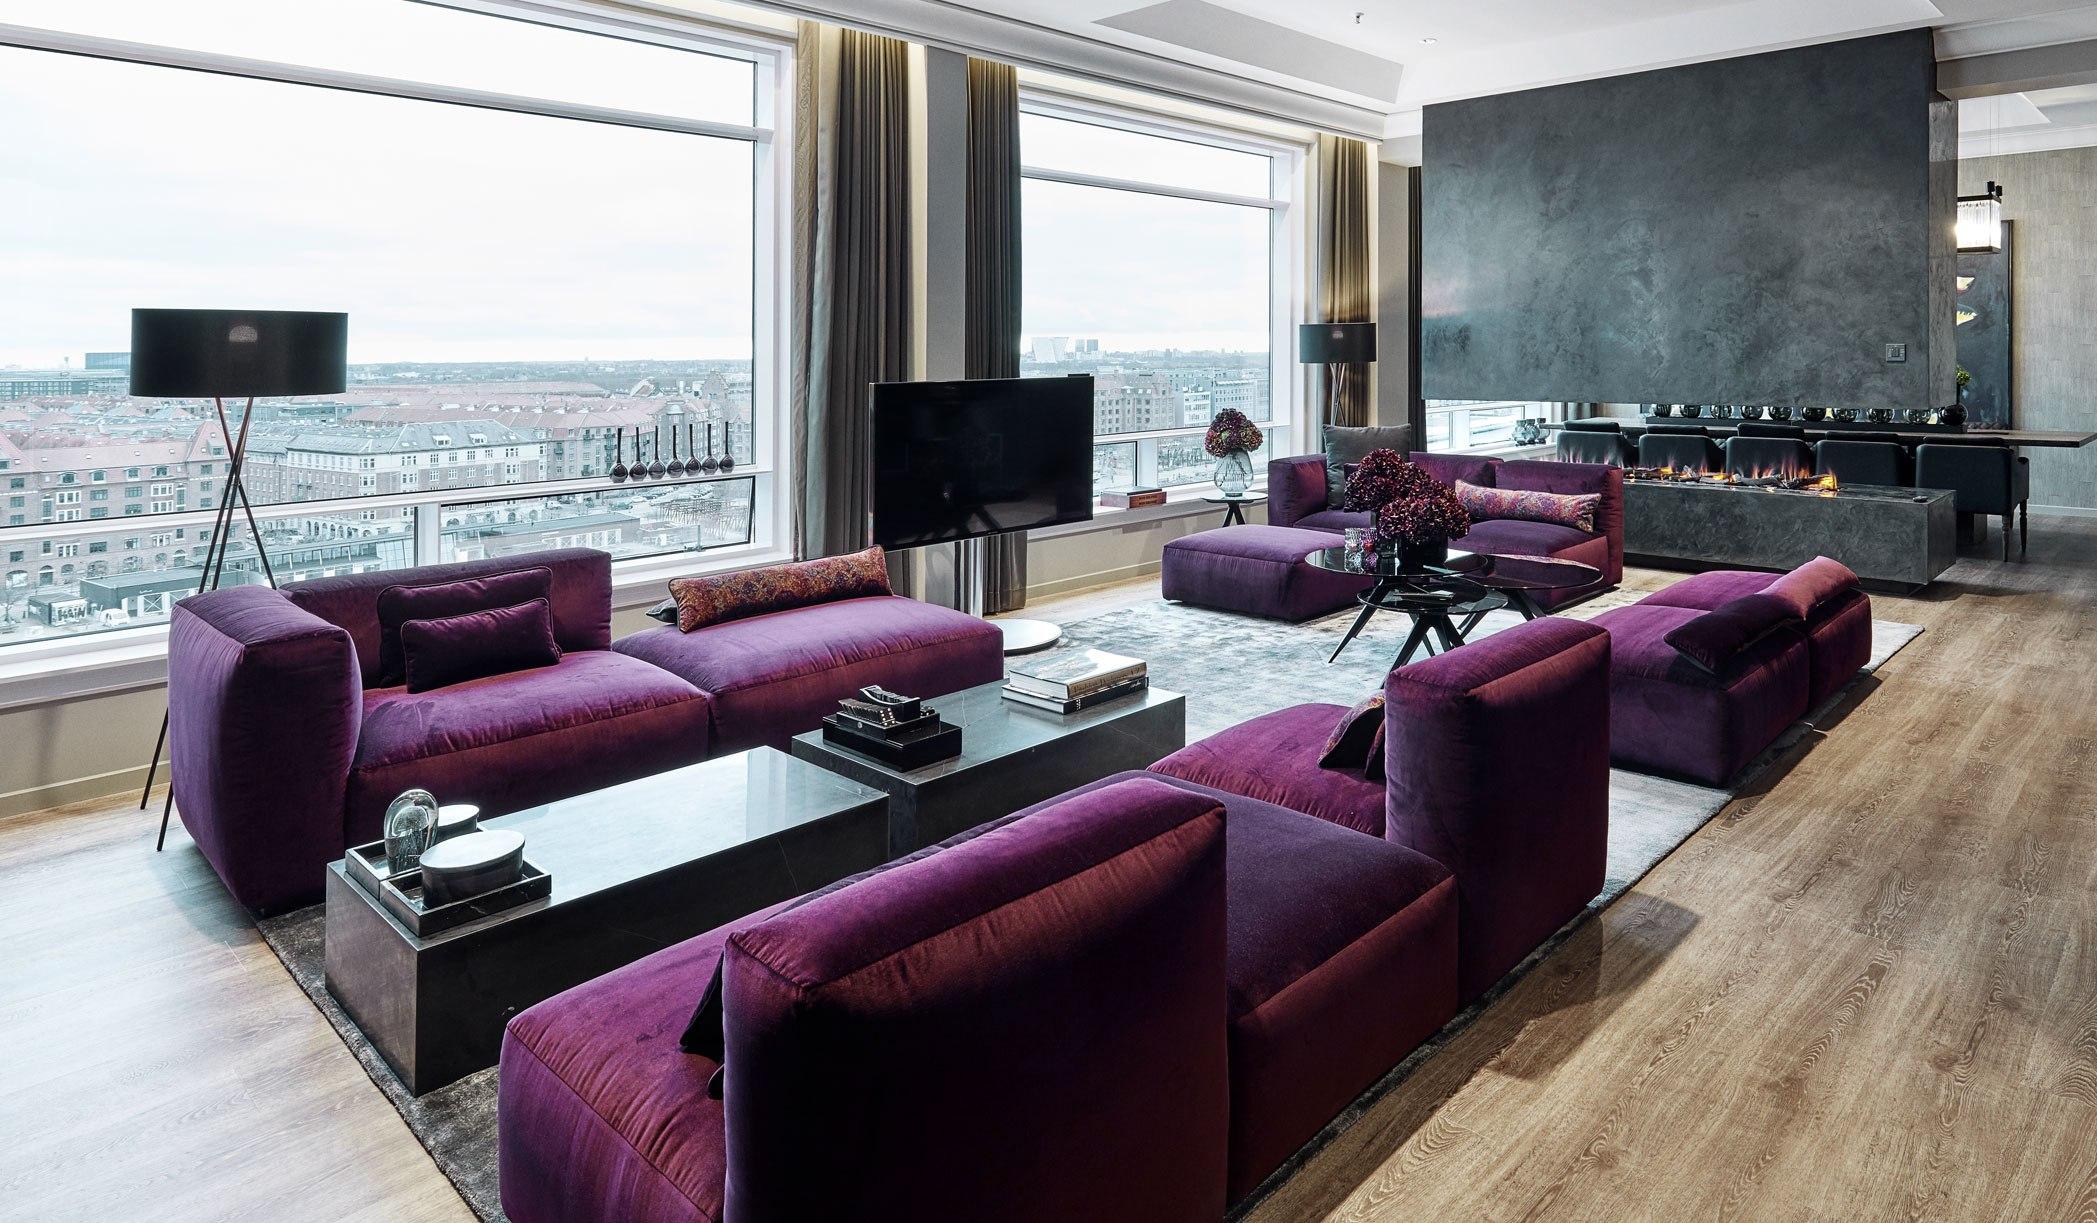 Lounge-området i Danmarks formentlig dyreste hotelsuite, Royal Suite på Copenhagen Marriott.